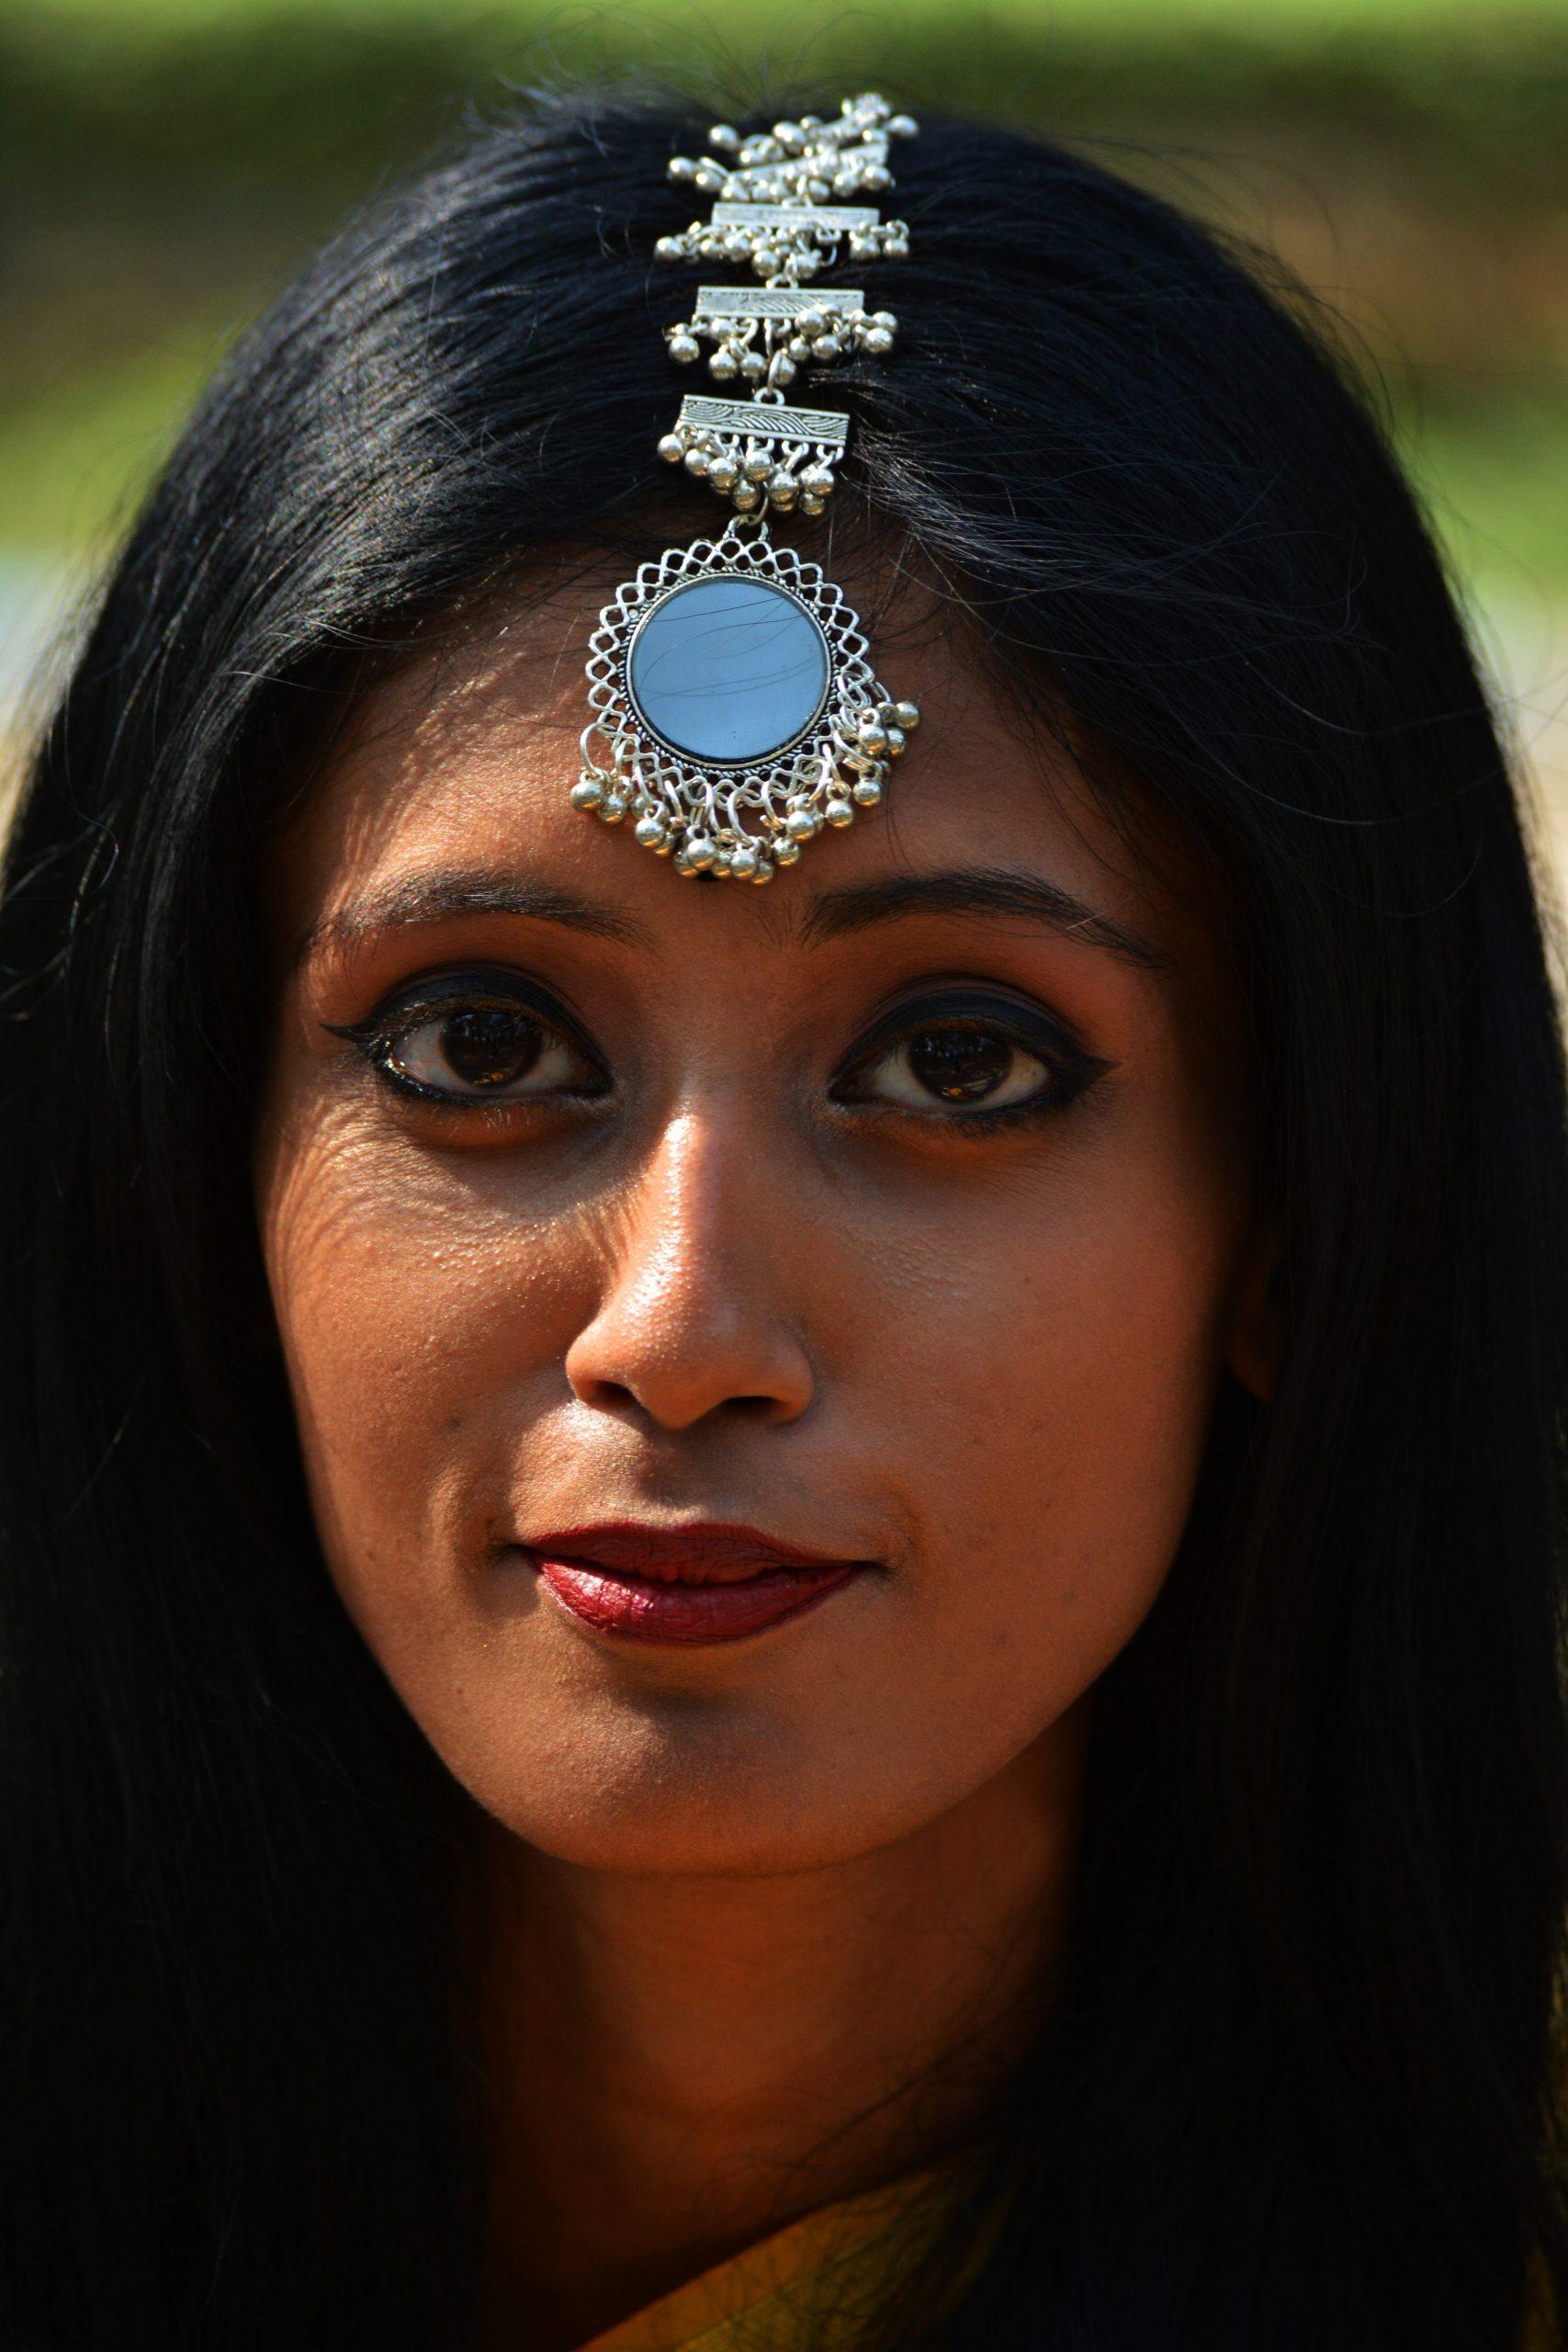 Face of an Indian girl